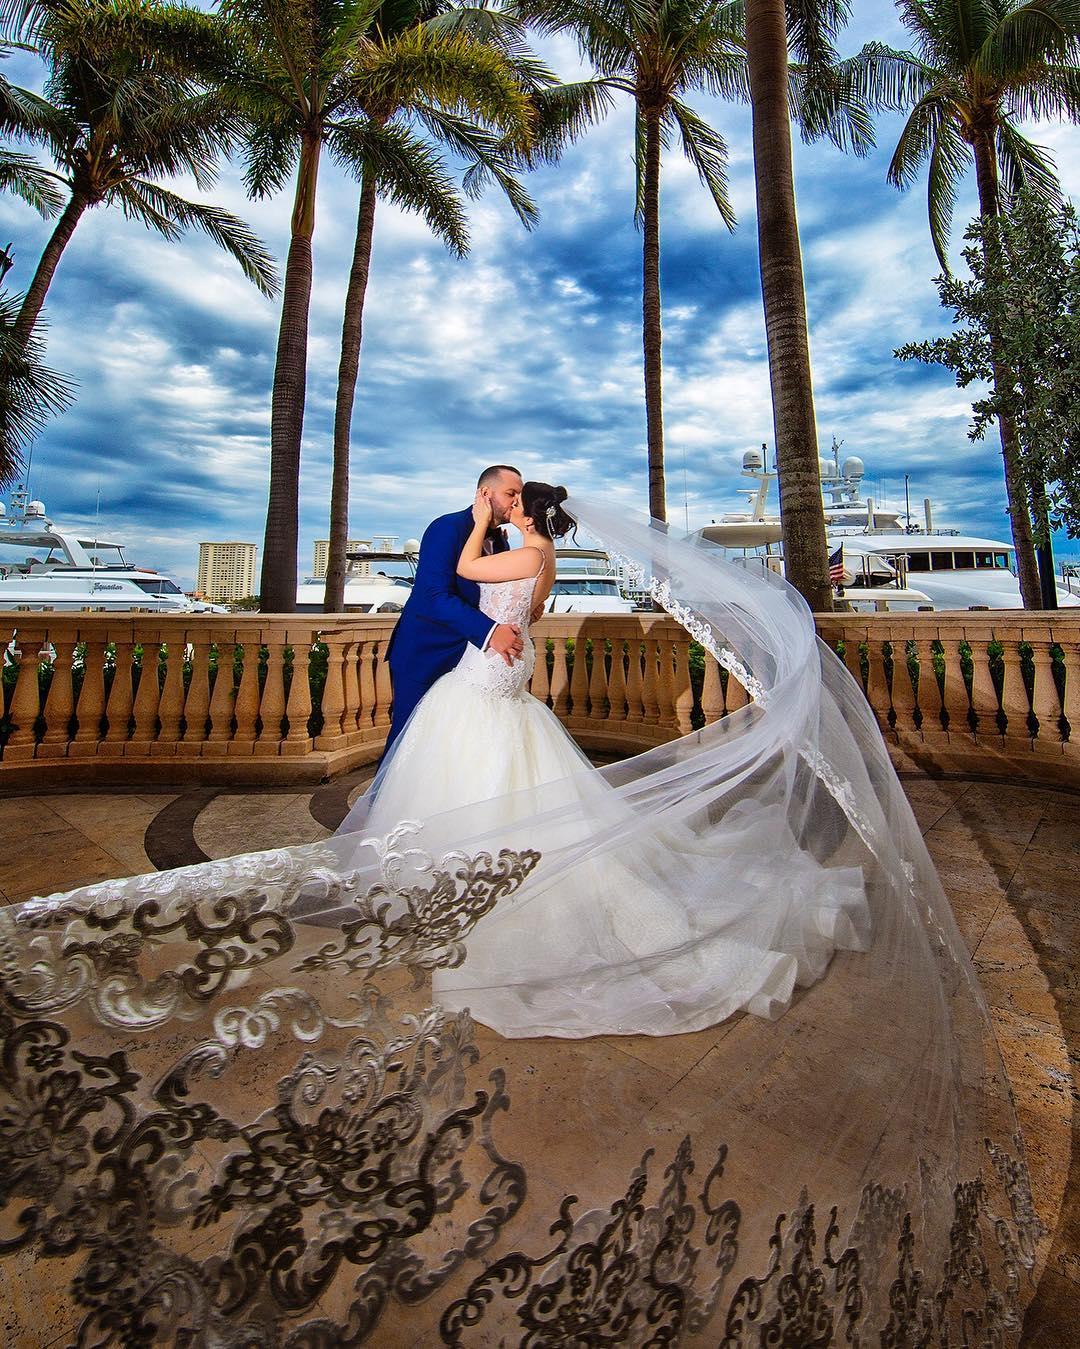 Palm Beach Wedding Photographer Instagram_Adam Opris Photo